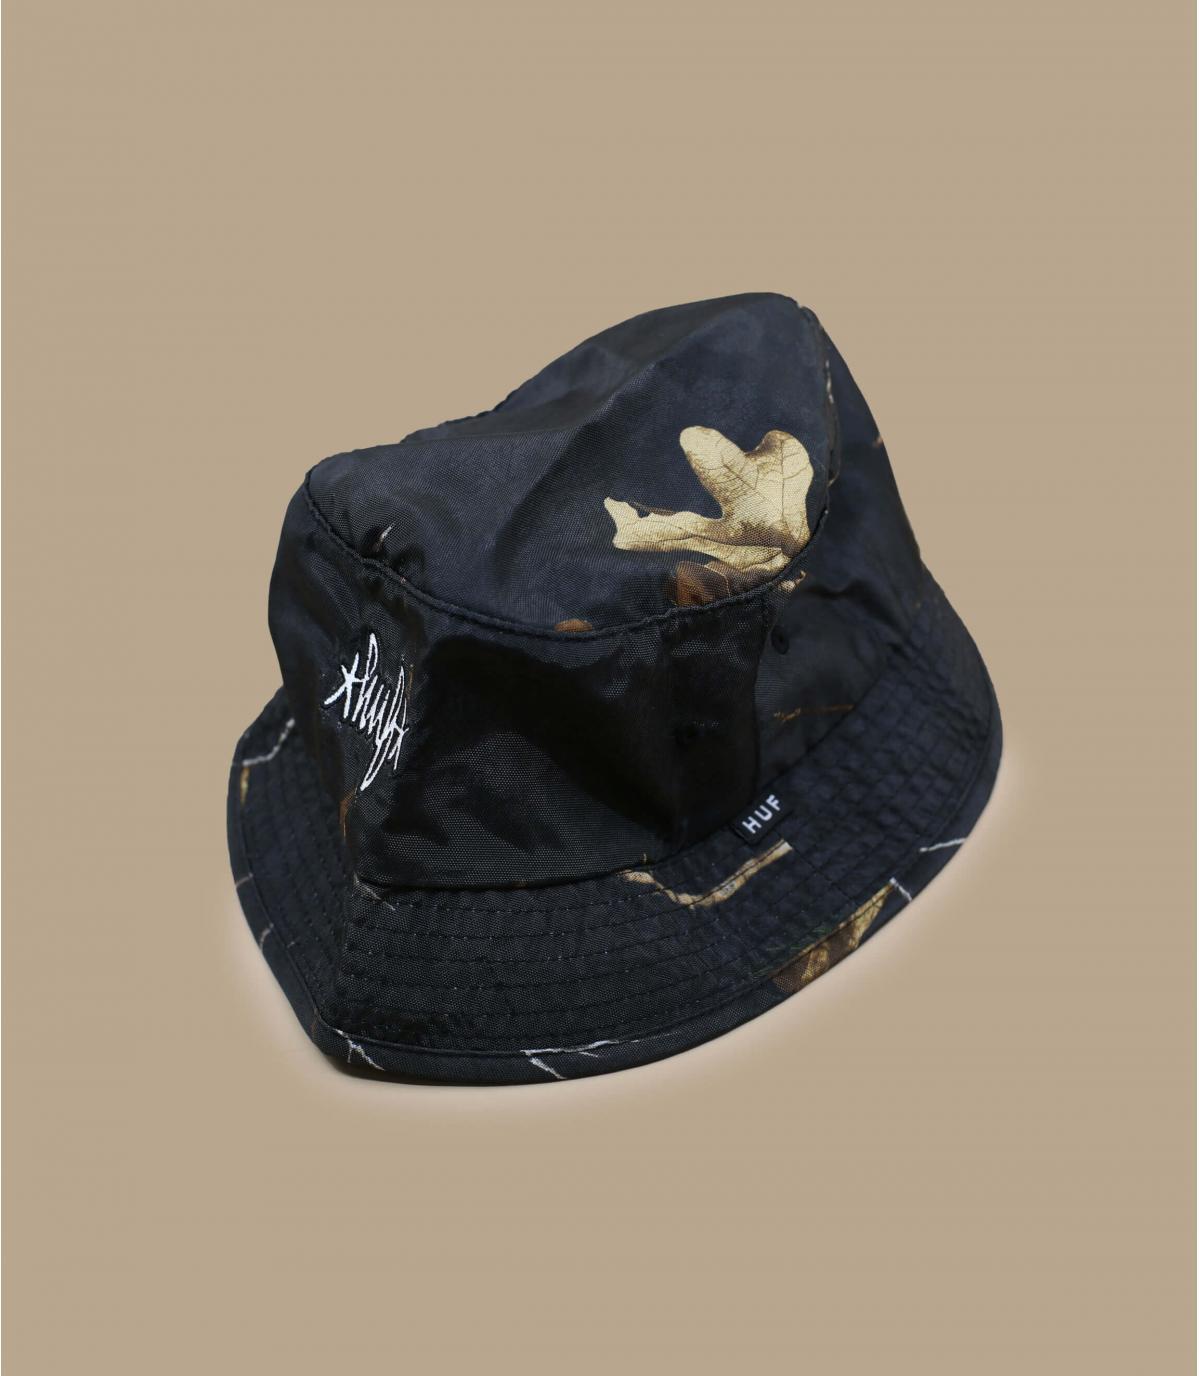 Black Realtree Huf bucket hat